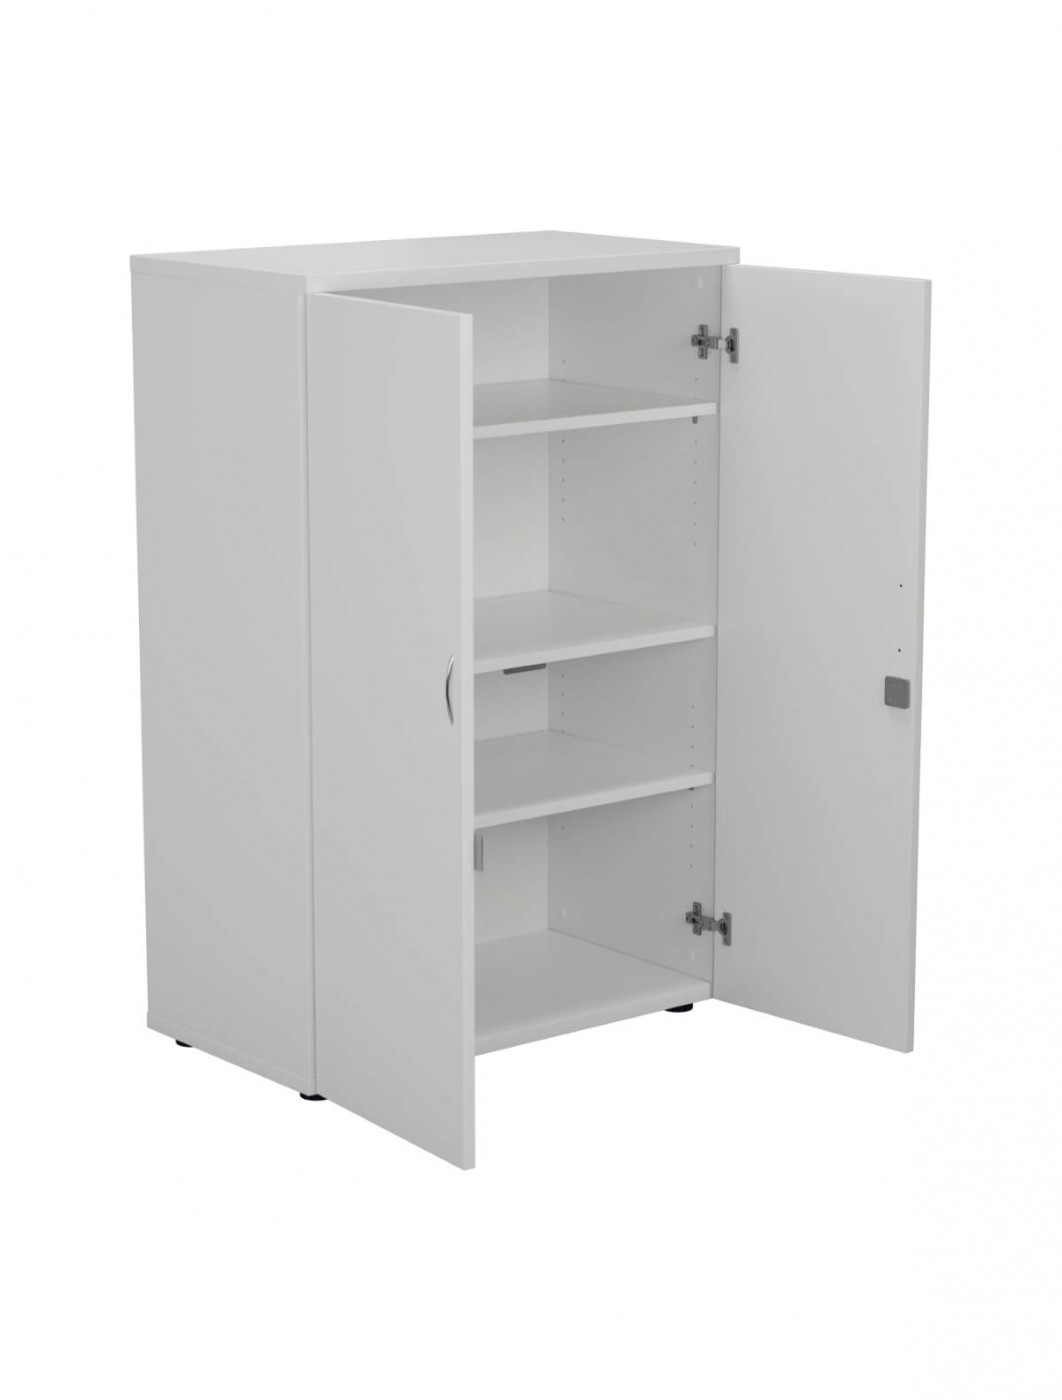 Office Storage Cupboard 1 2m Cupboard Tes1245cp Cupboards 121 Office Furniture